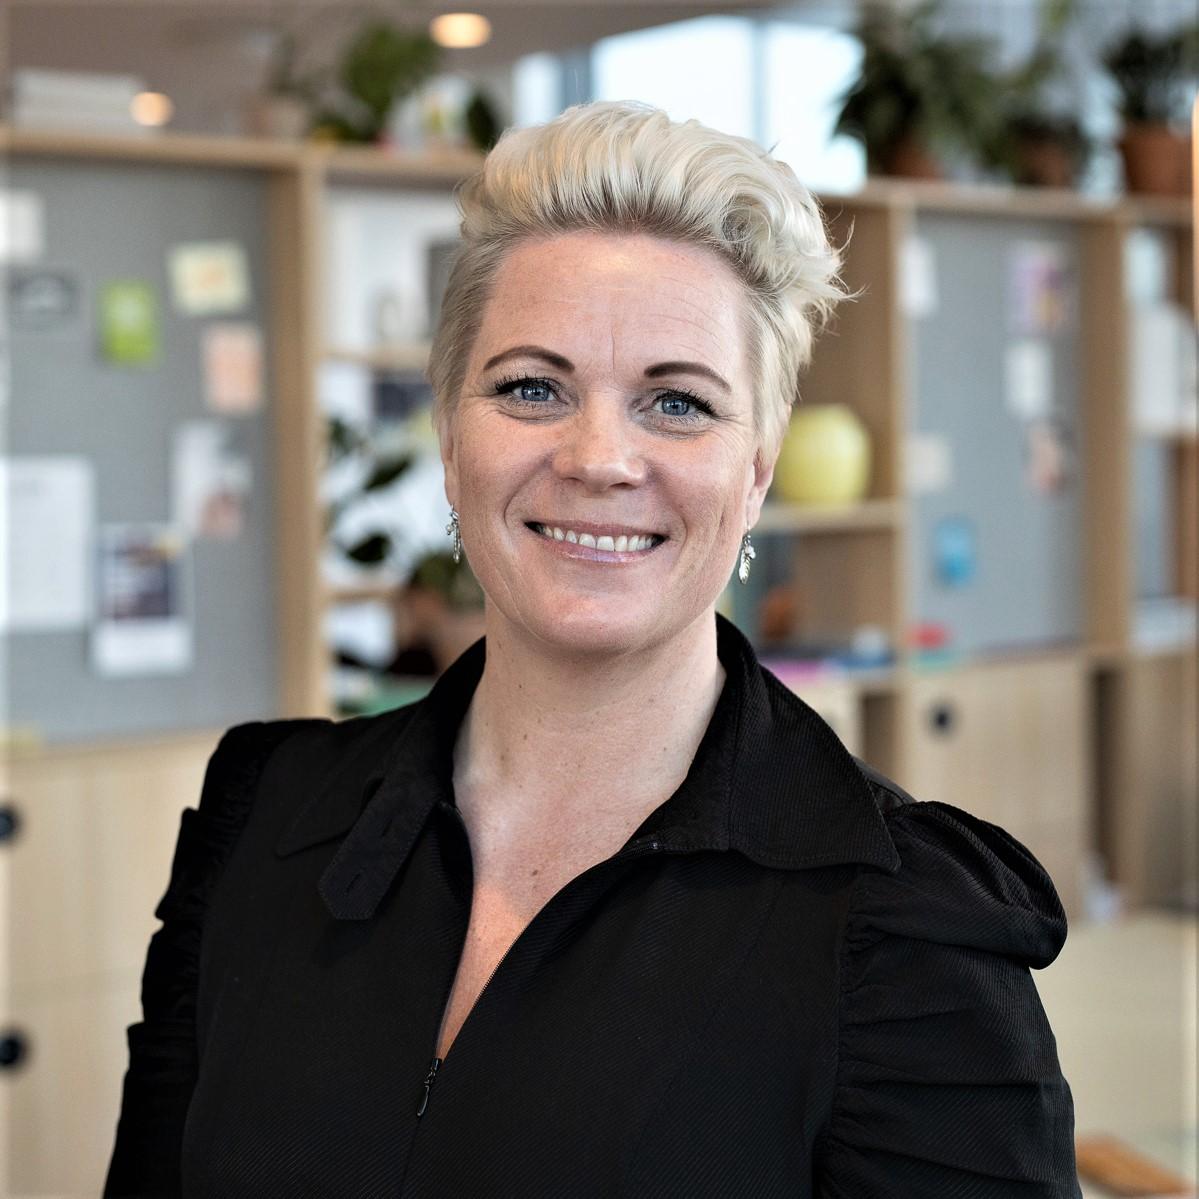 Maria Benholm